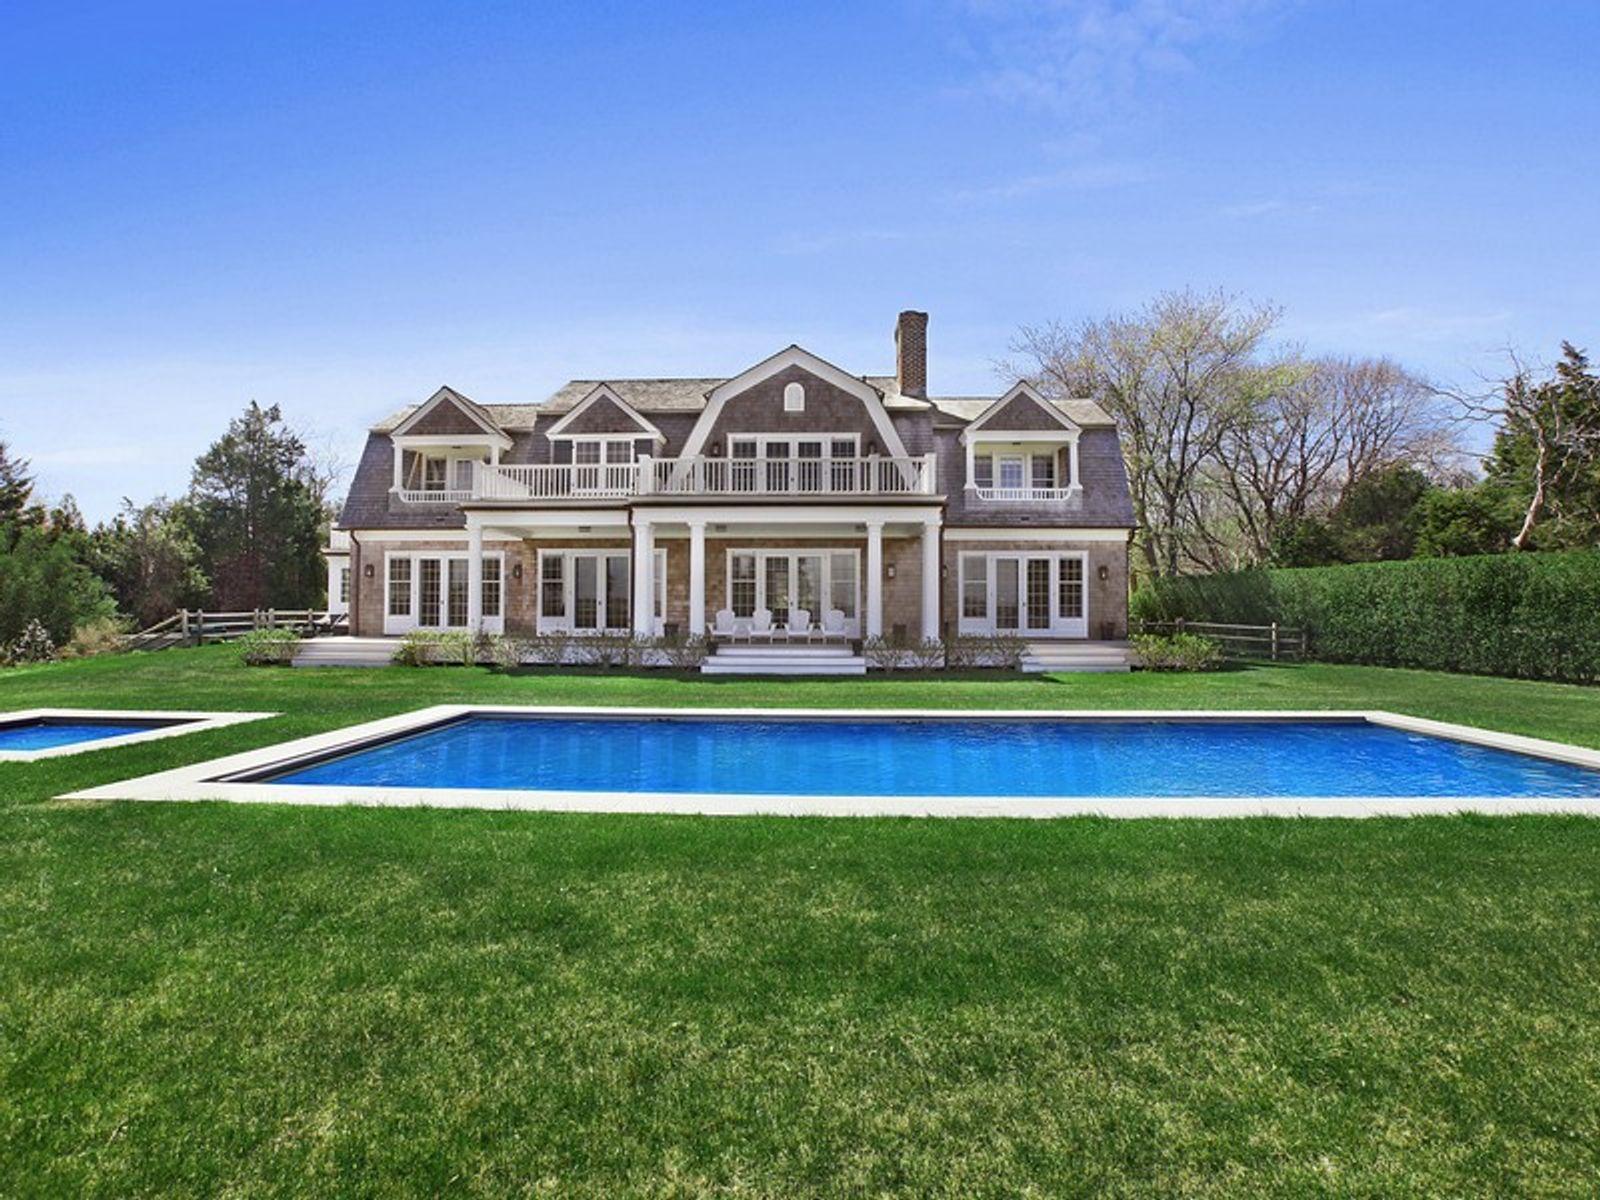 Sag harbor bayfront sag harbor ny single family home for Hamptons home for sale